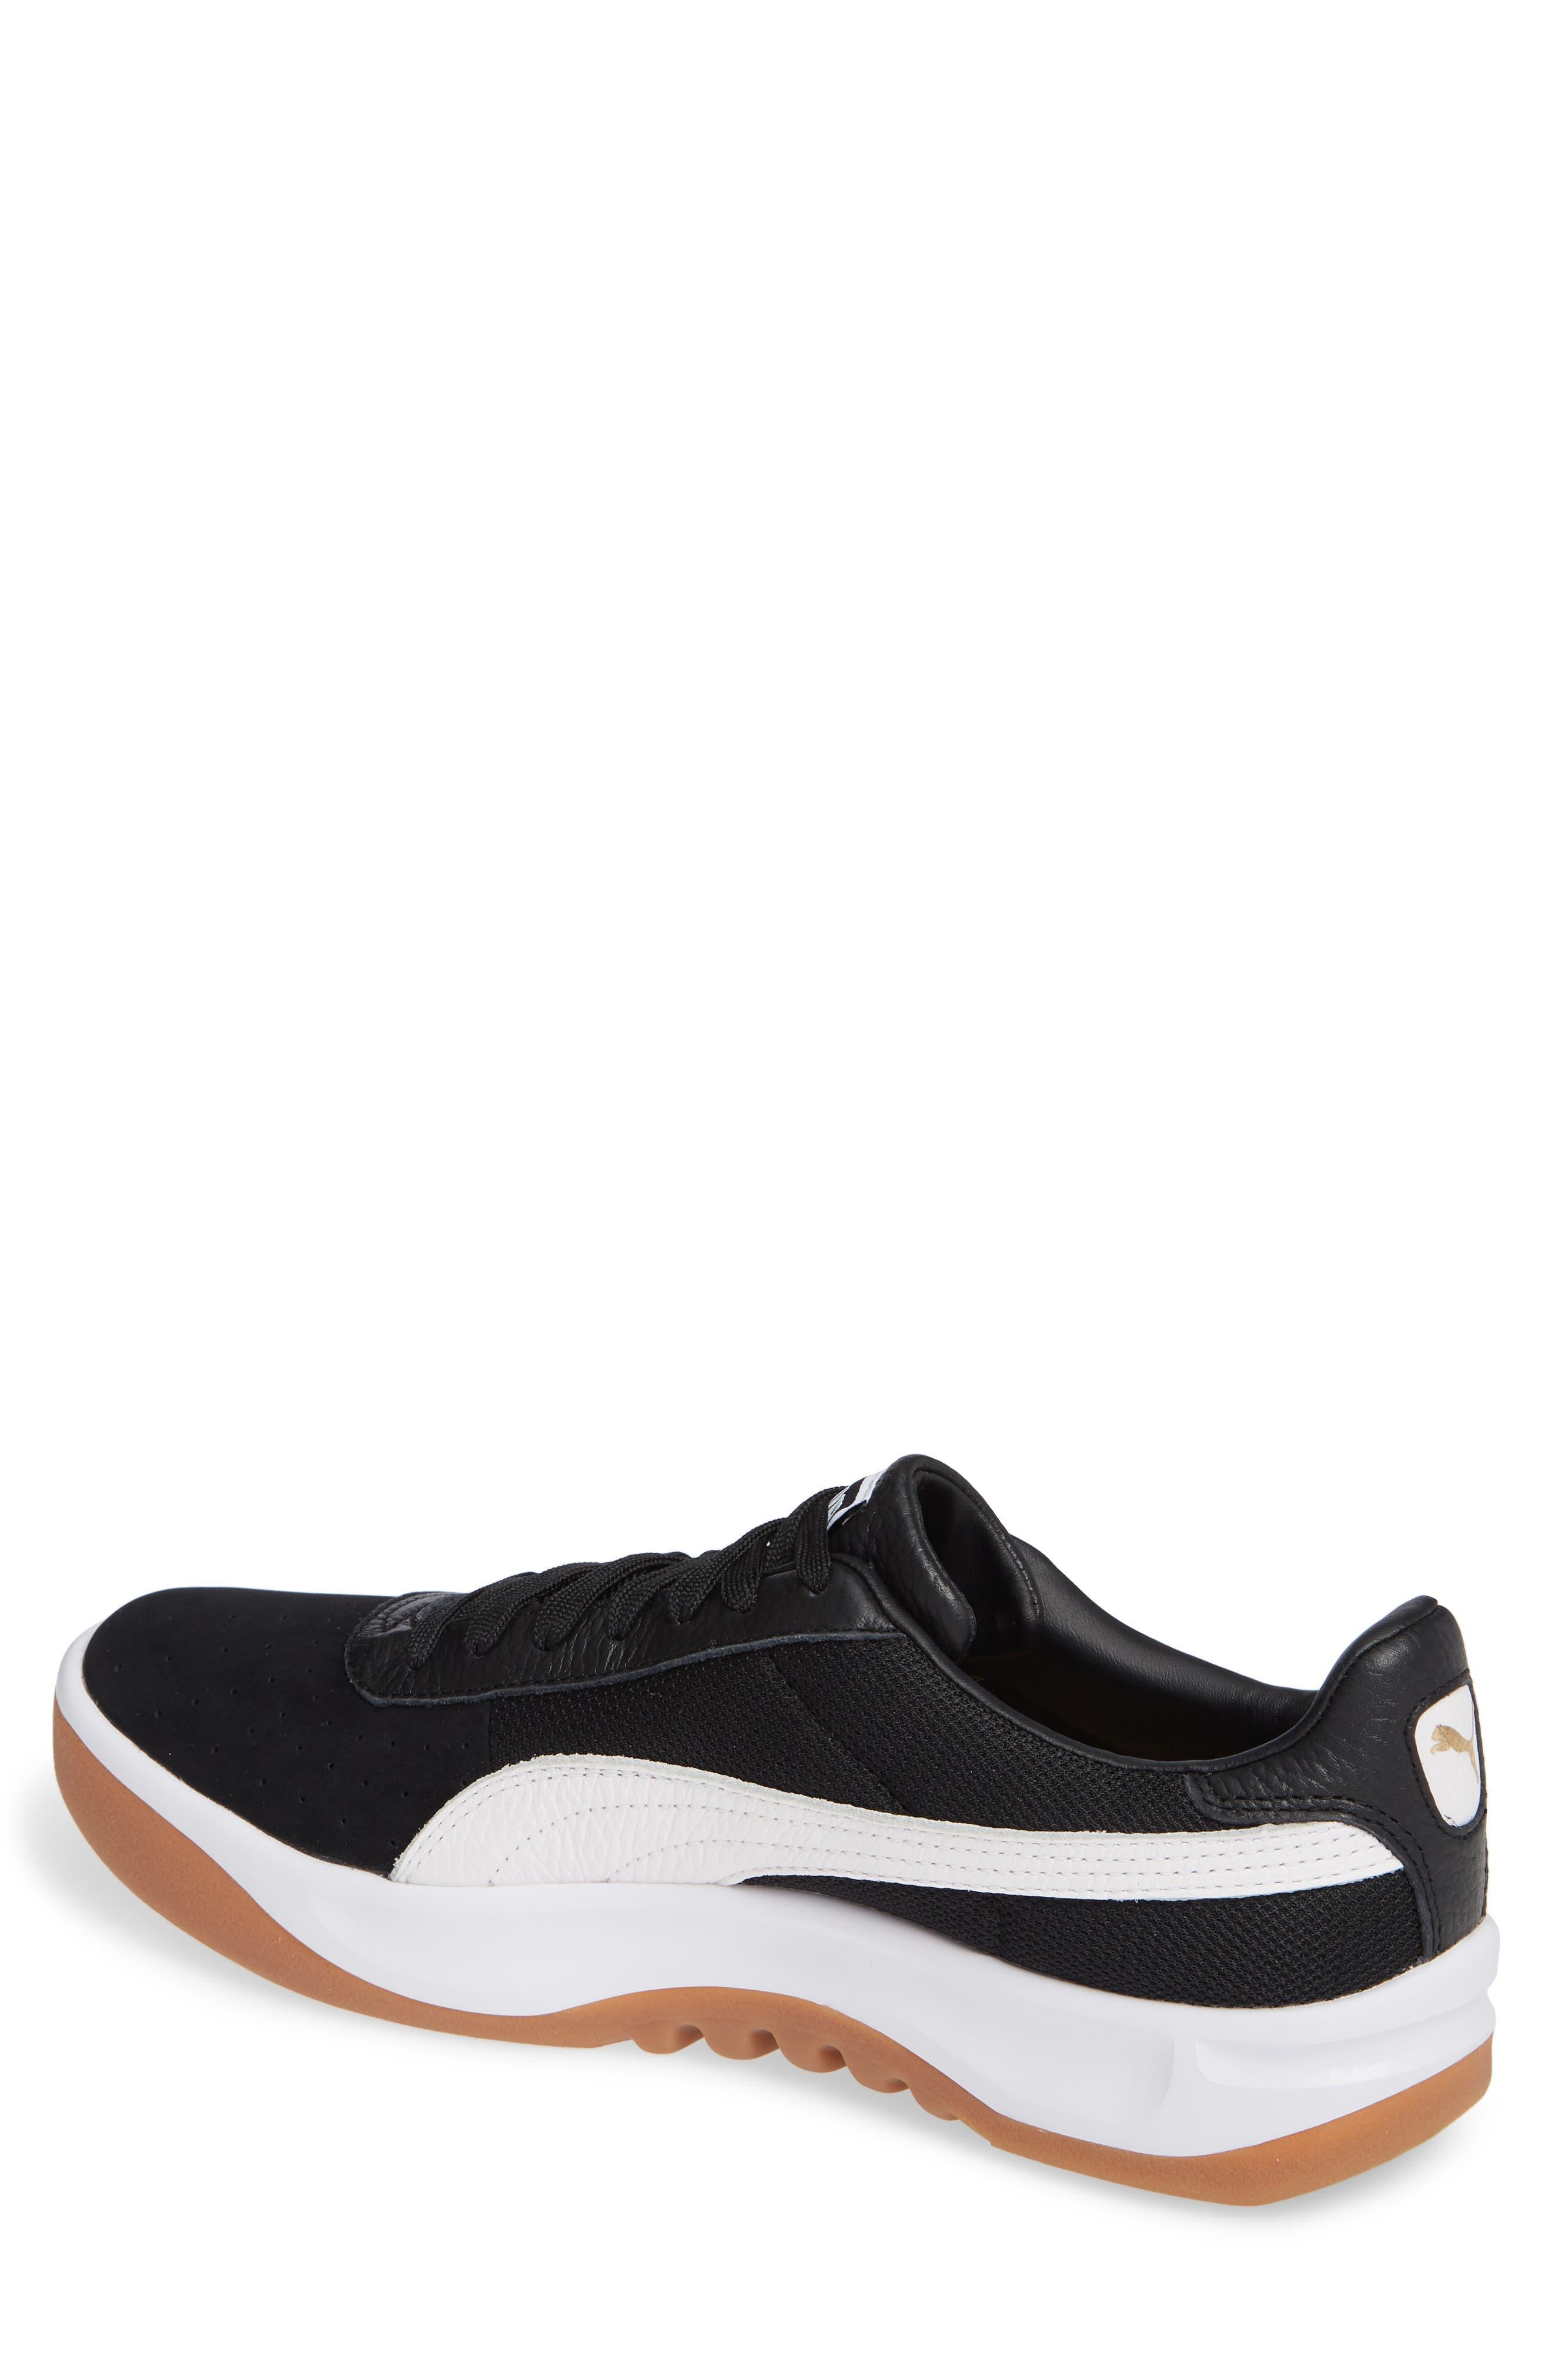 PUMA,                             California Casual Sneaker,                             Alternate thumbnail 2, color,                             001